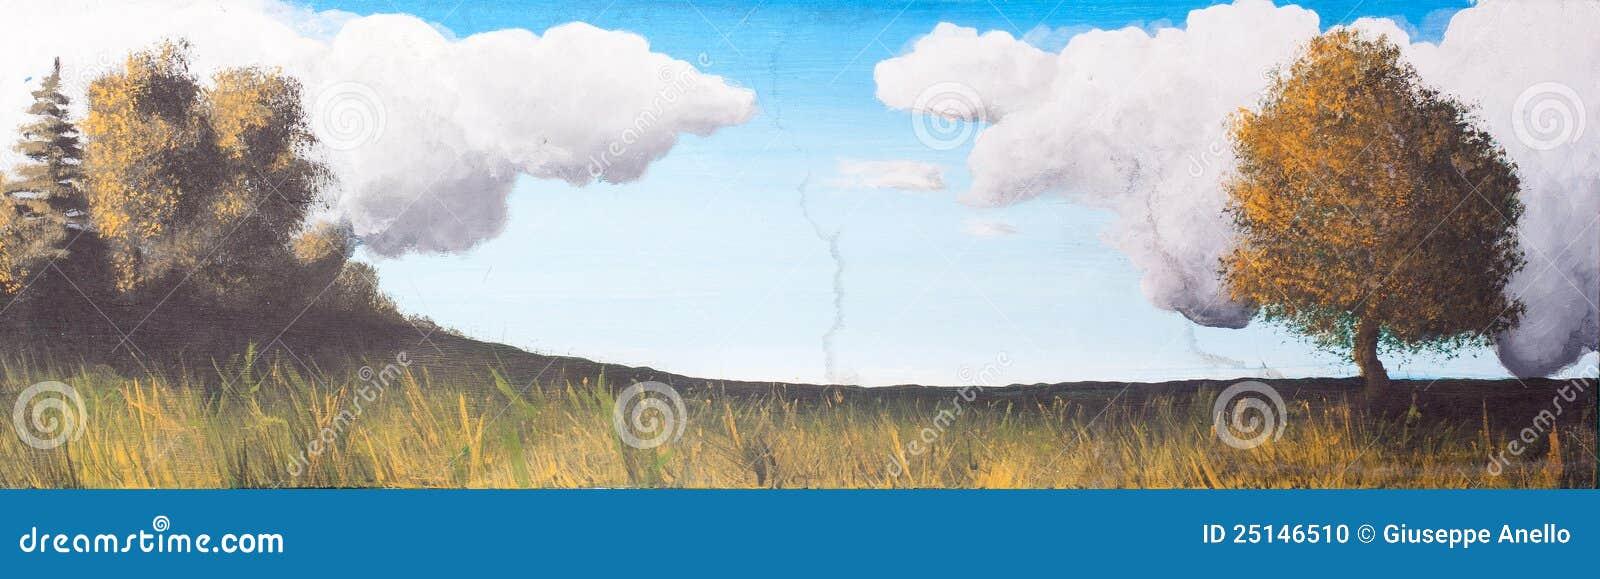 photo stock horizontal peinture sur la toile image